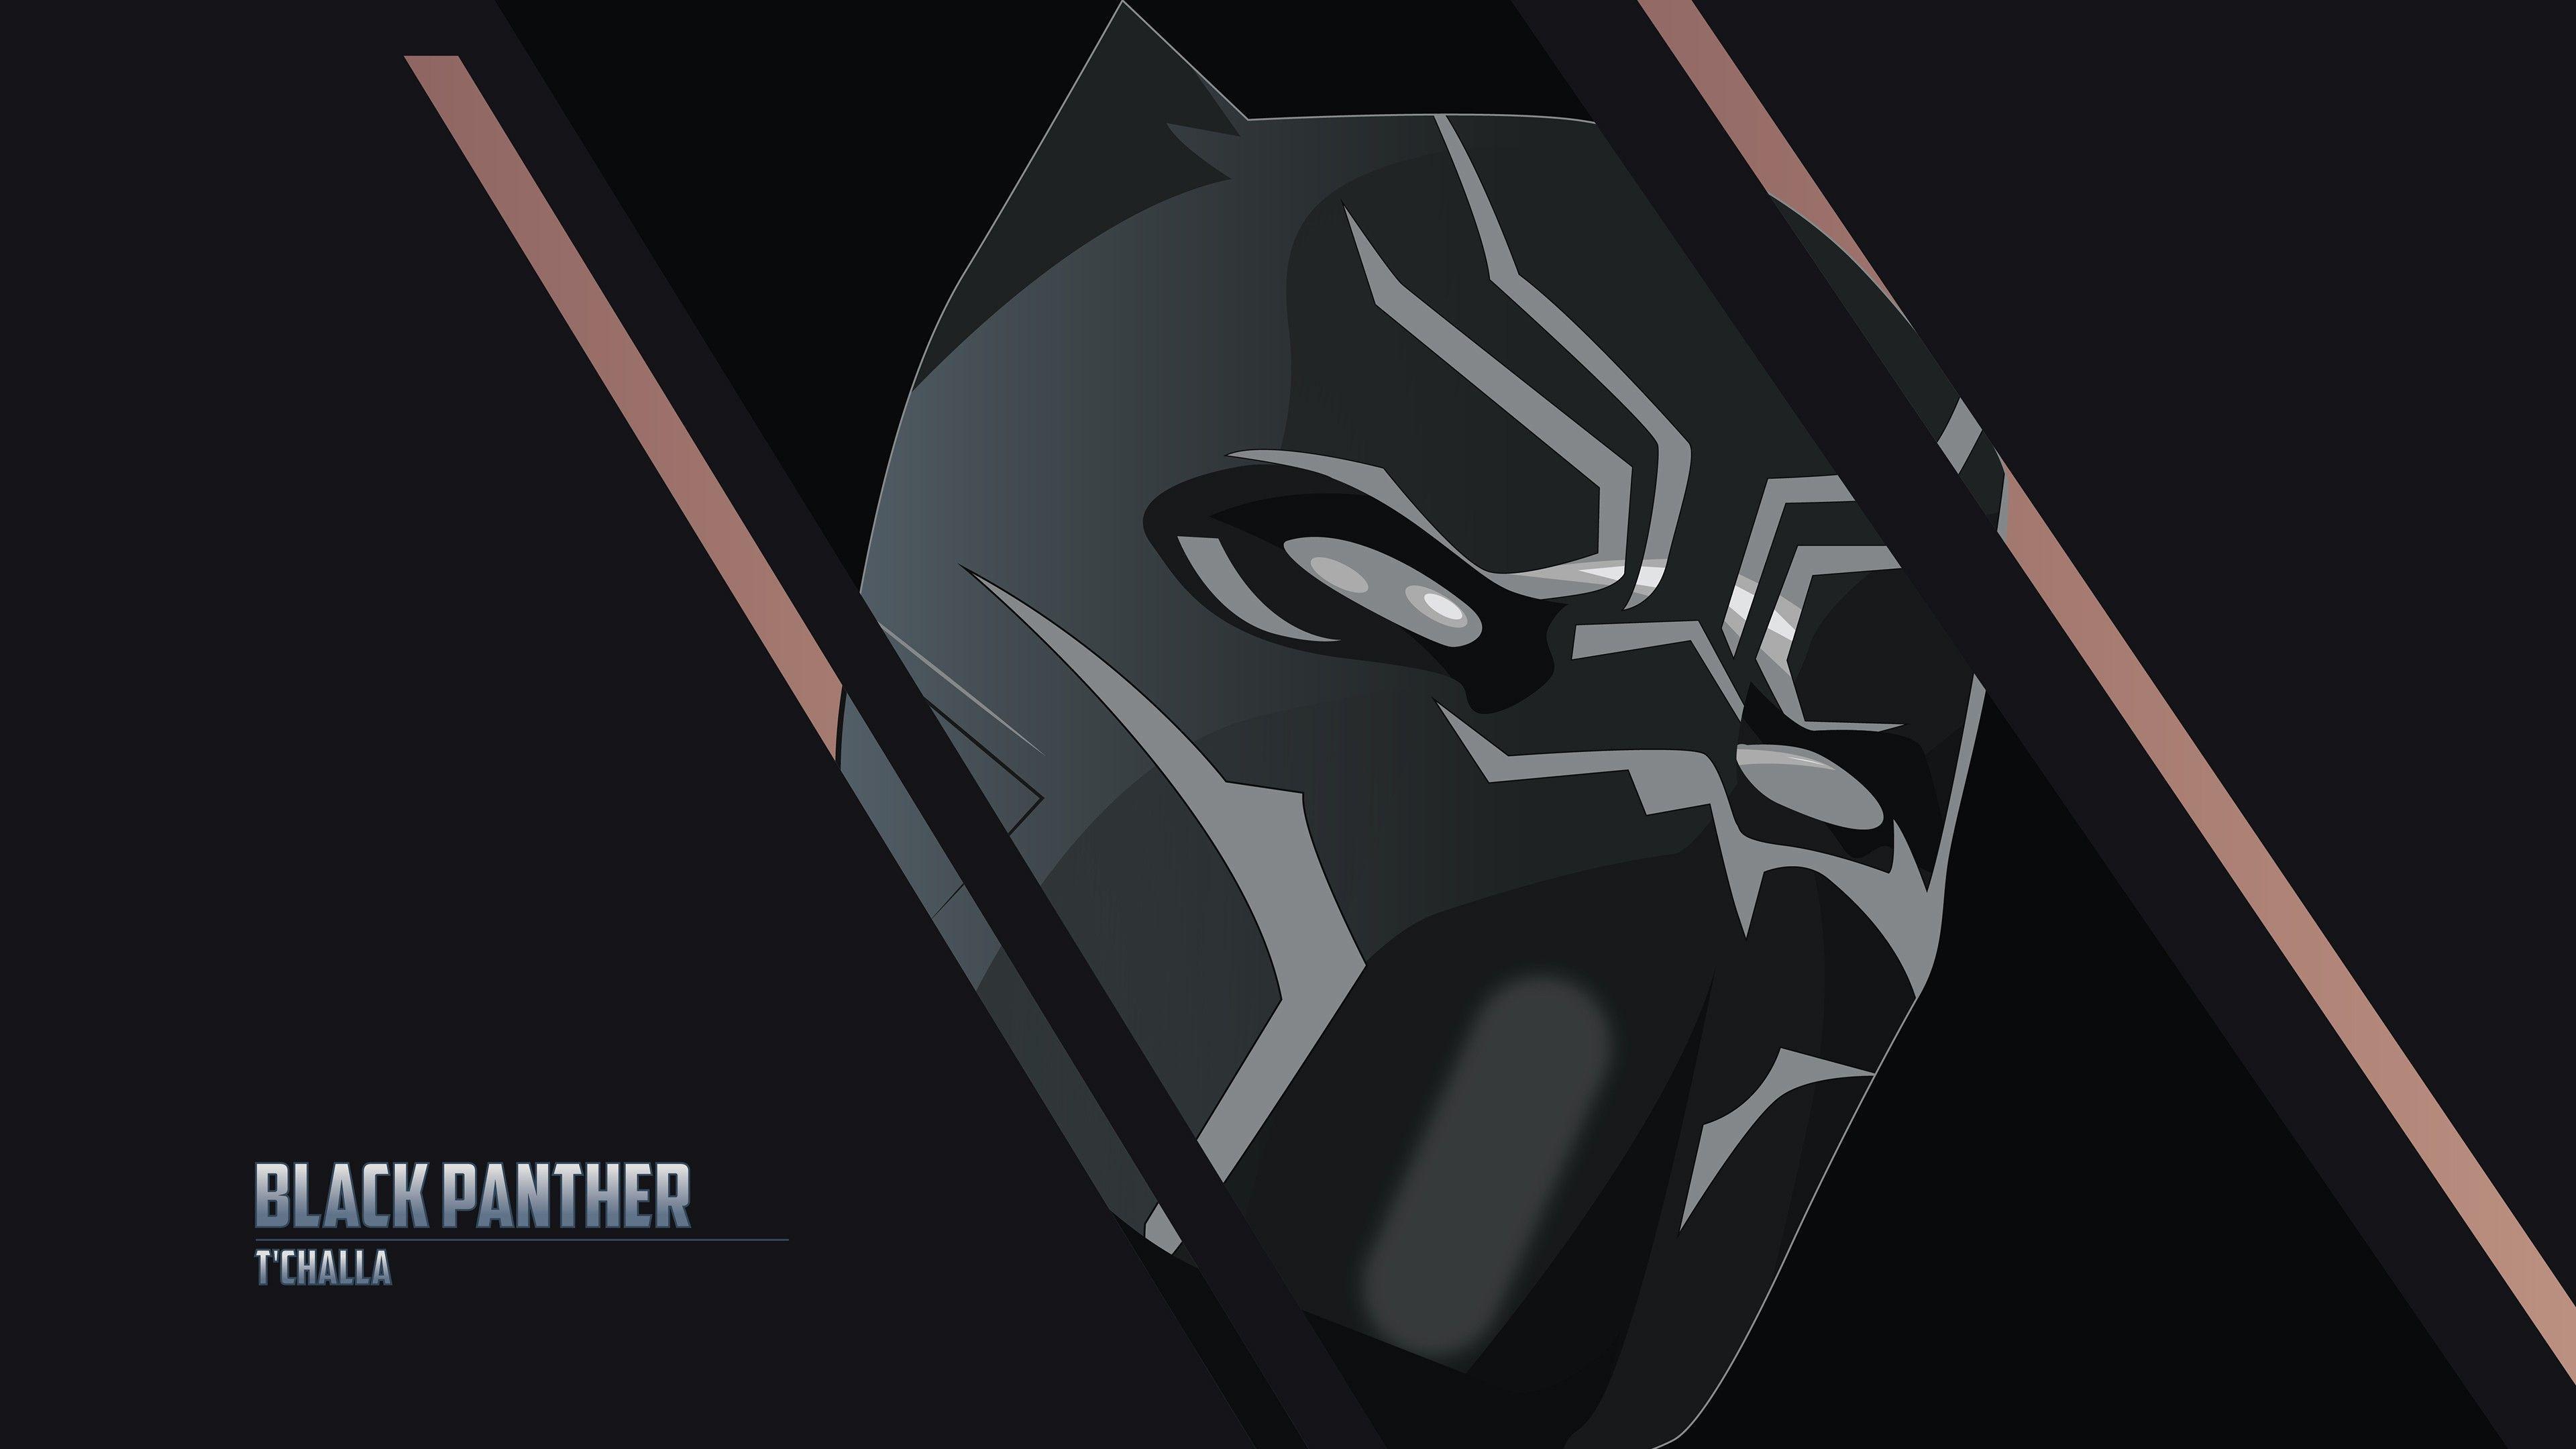 Black Panther 4k Ultra Hd Dark Wallpapers Top Free Black Panther 4k Ultra Hd Dark Backgrounds Wallpaperaccess